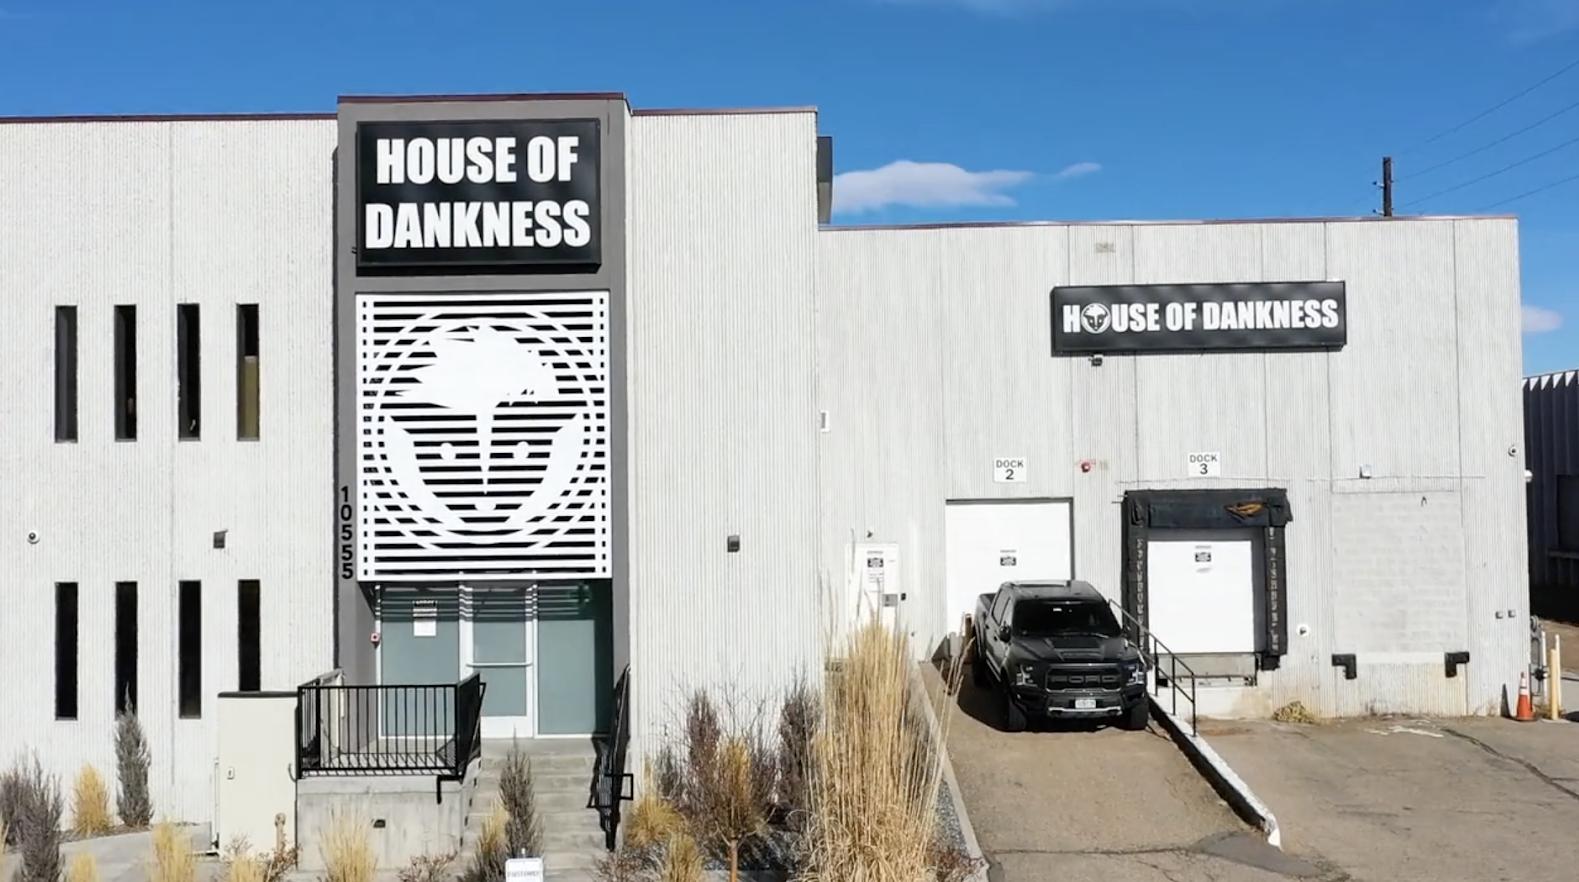 House of Dankness